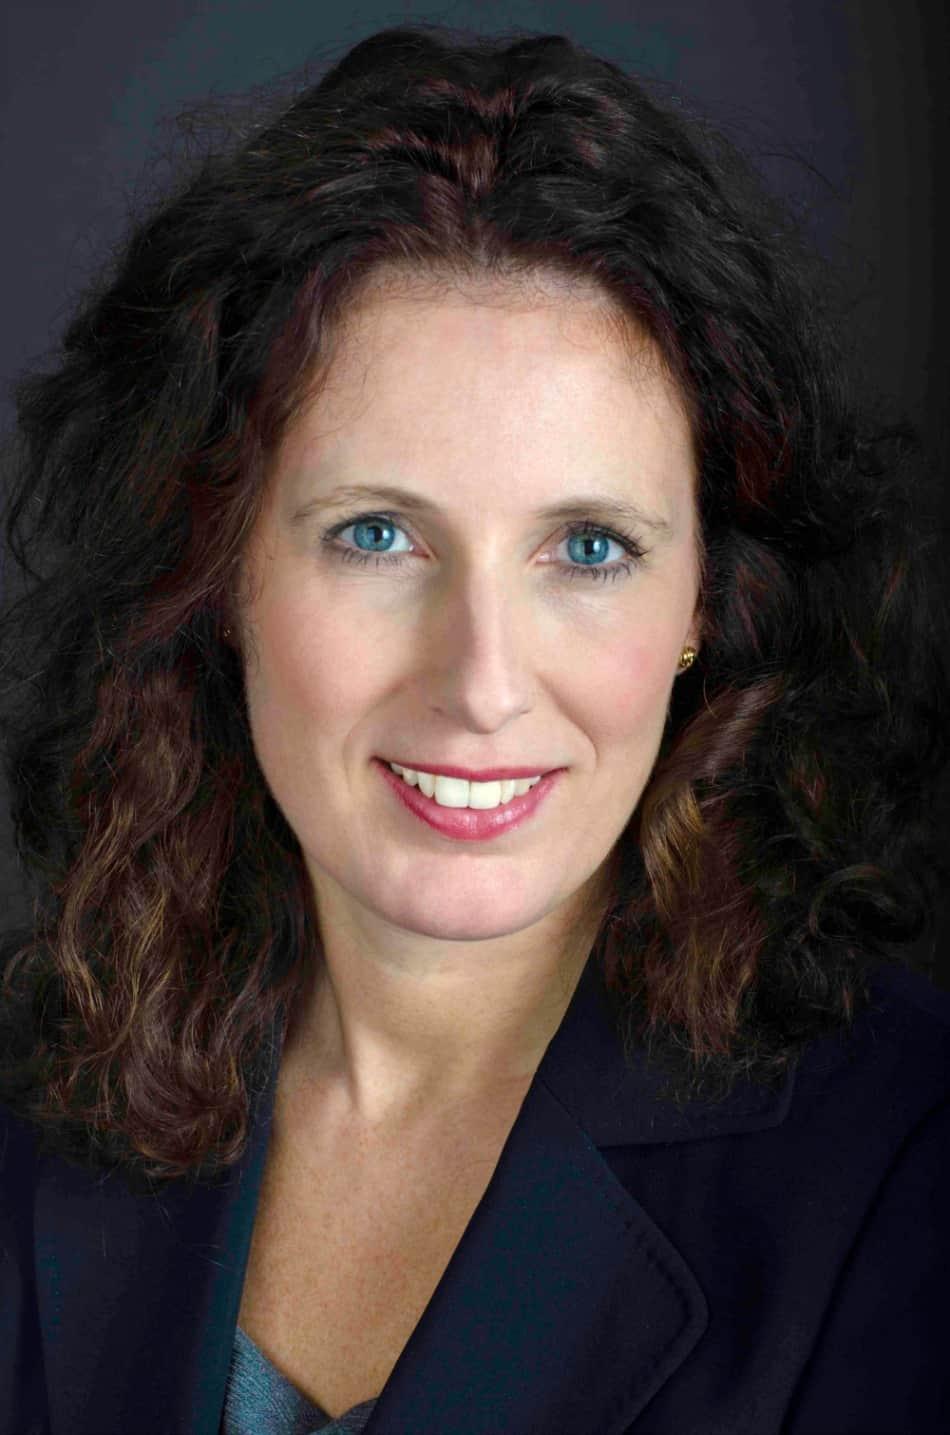 Suzanne Gatrell |  Victoria Hospitality Partner & Hotel Management PowHERhouse